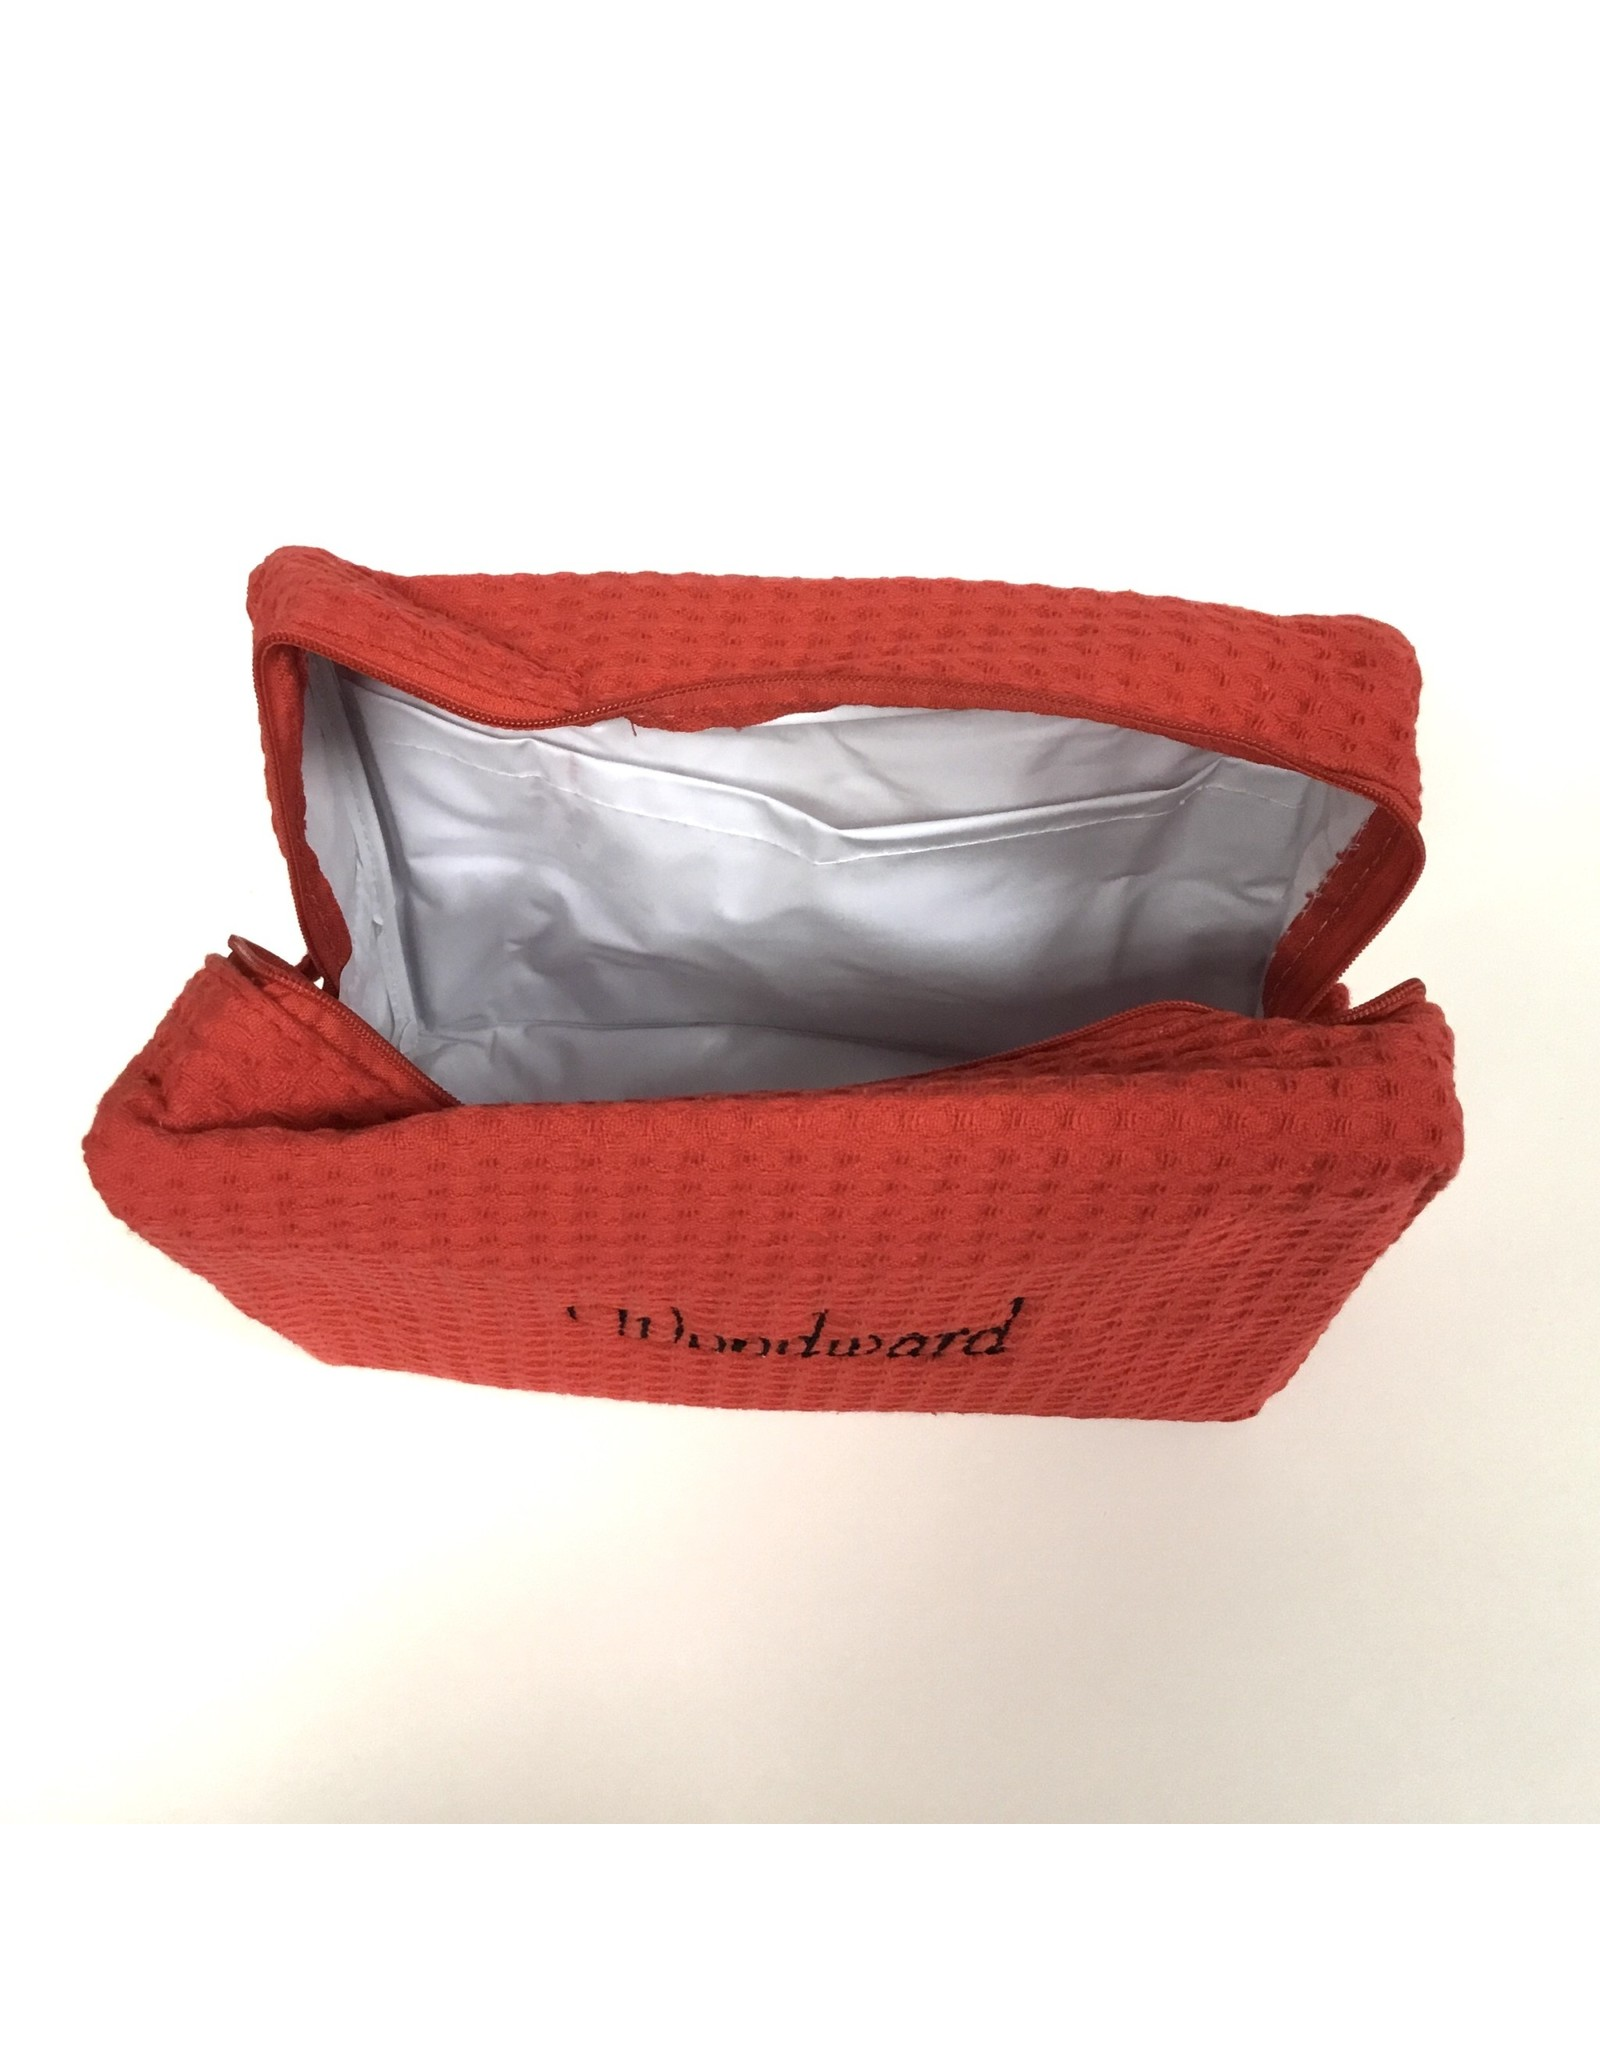 Handmade Vendor SALE COSMETIC CASE